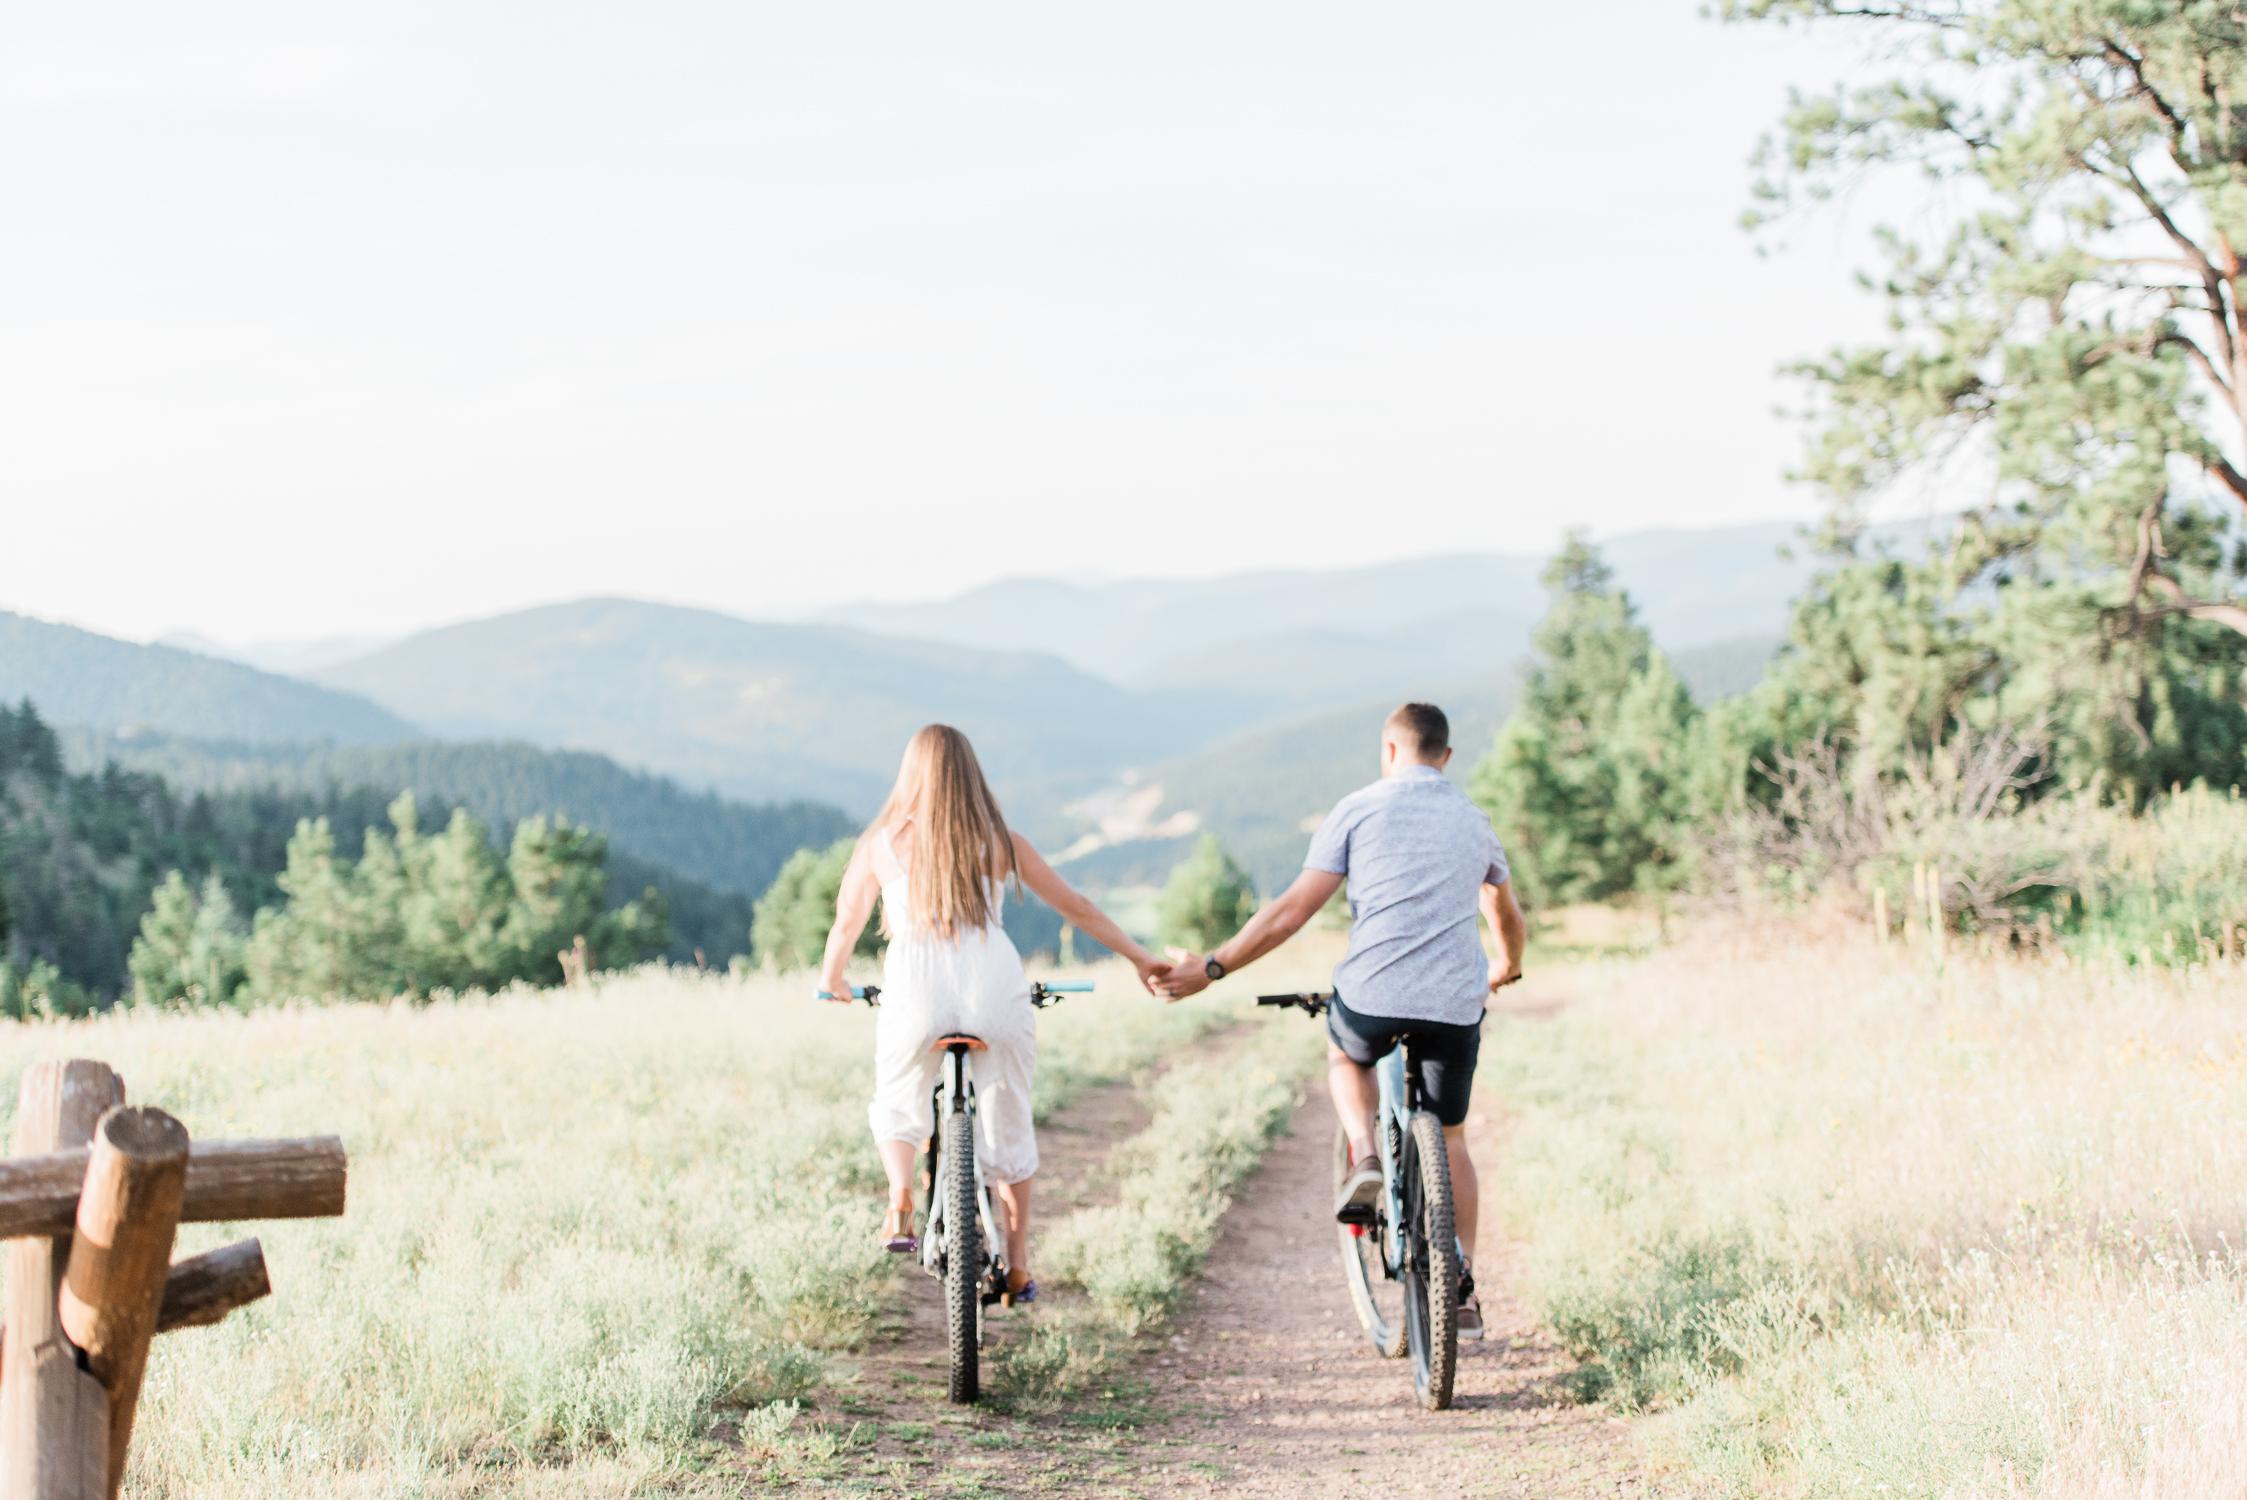 2019-08-30-Engagement-Morgan-Adam-MtFalcon-1617.jpg